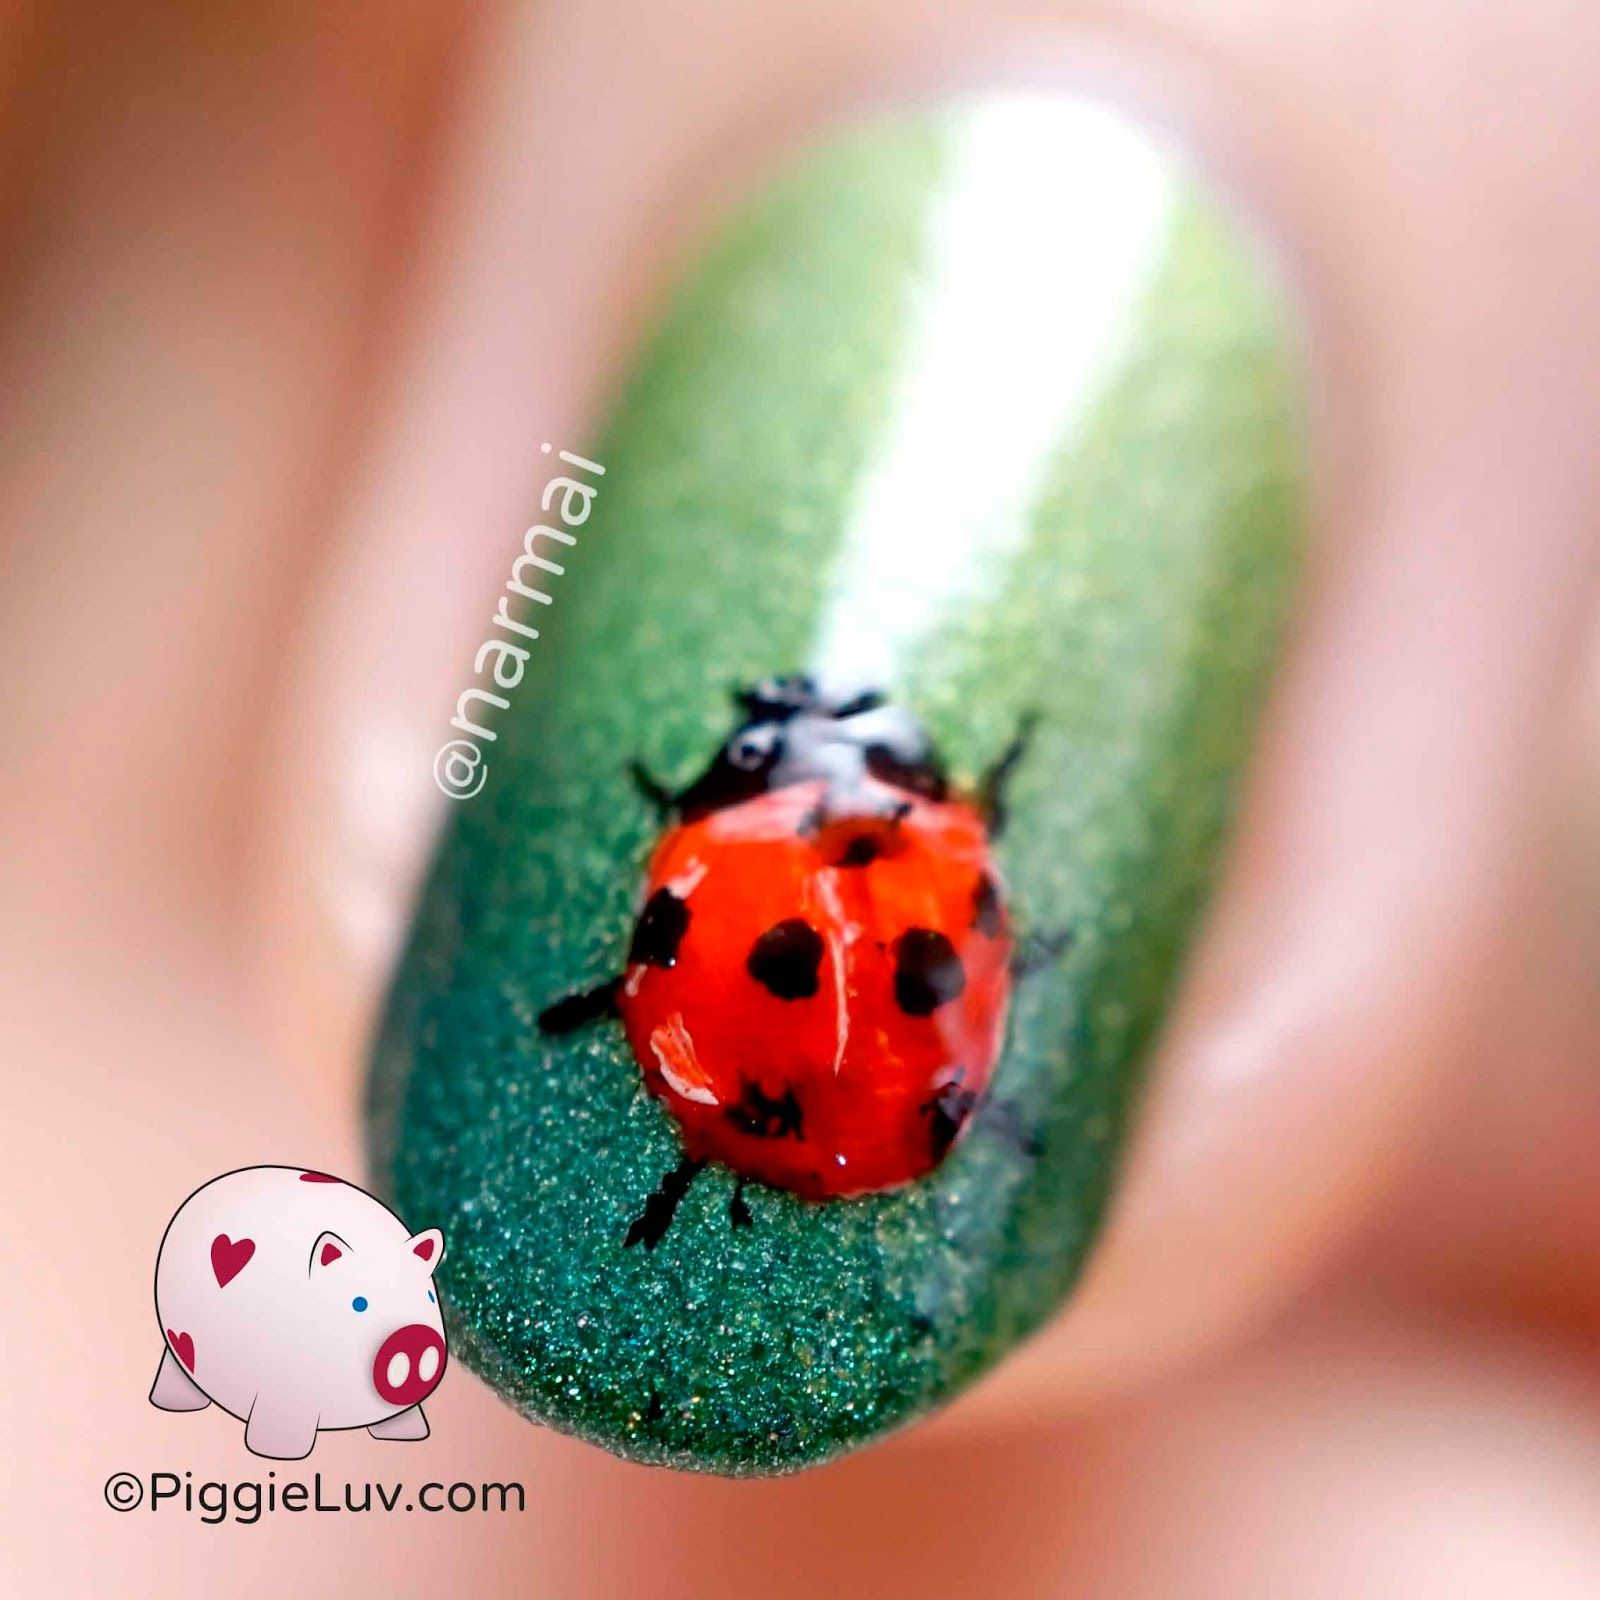 Freehand ladybug nail art | Pinterest | Ladybug nail art, Fast nail ...